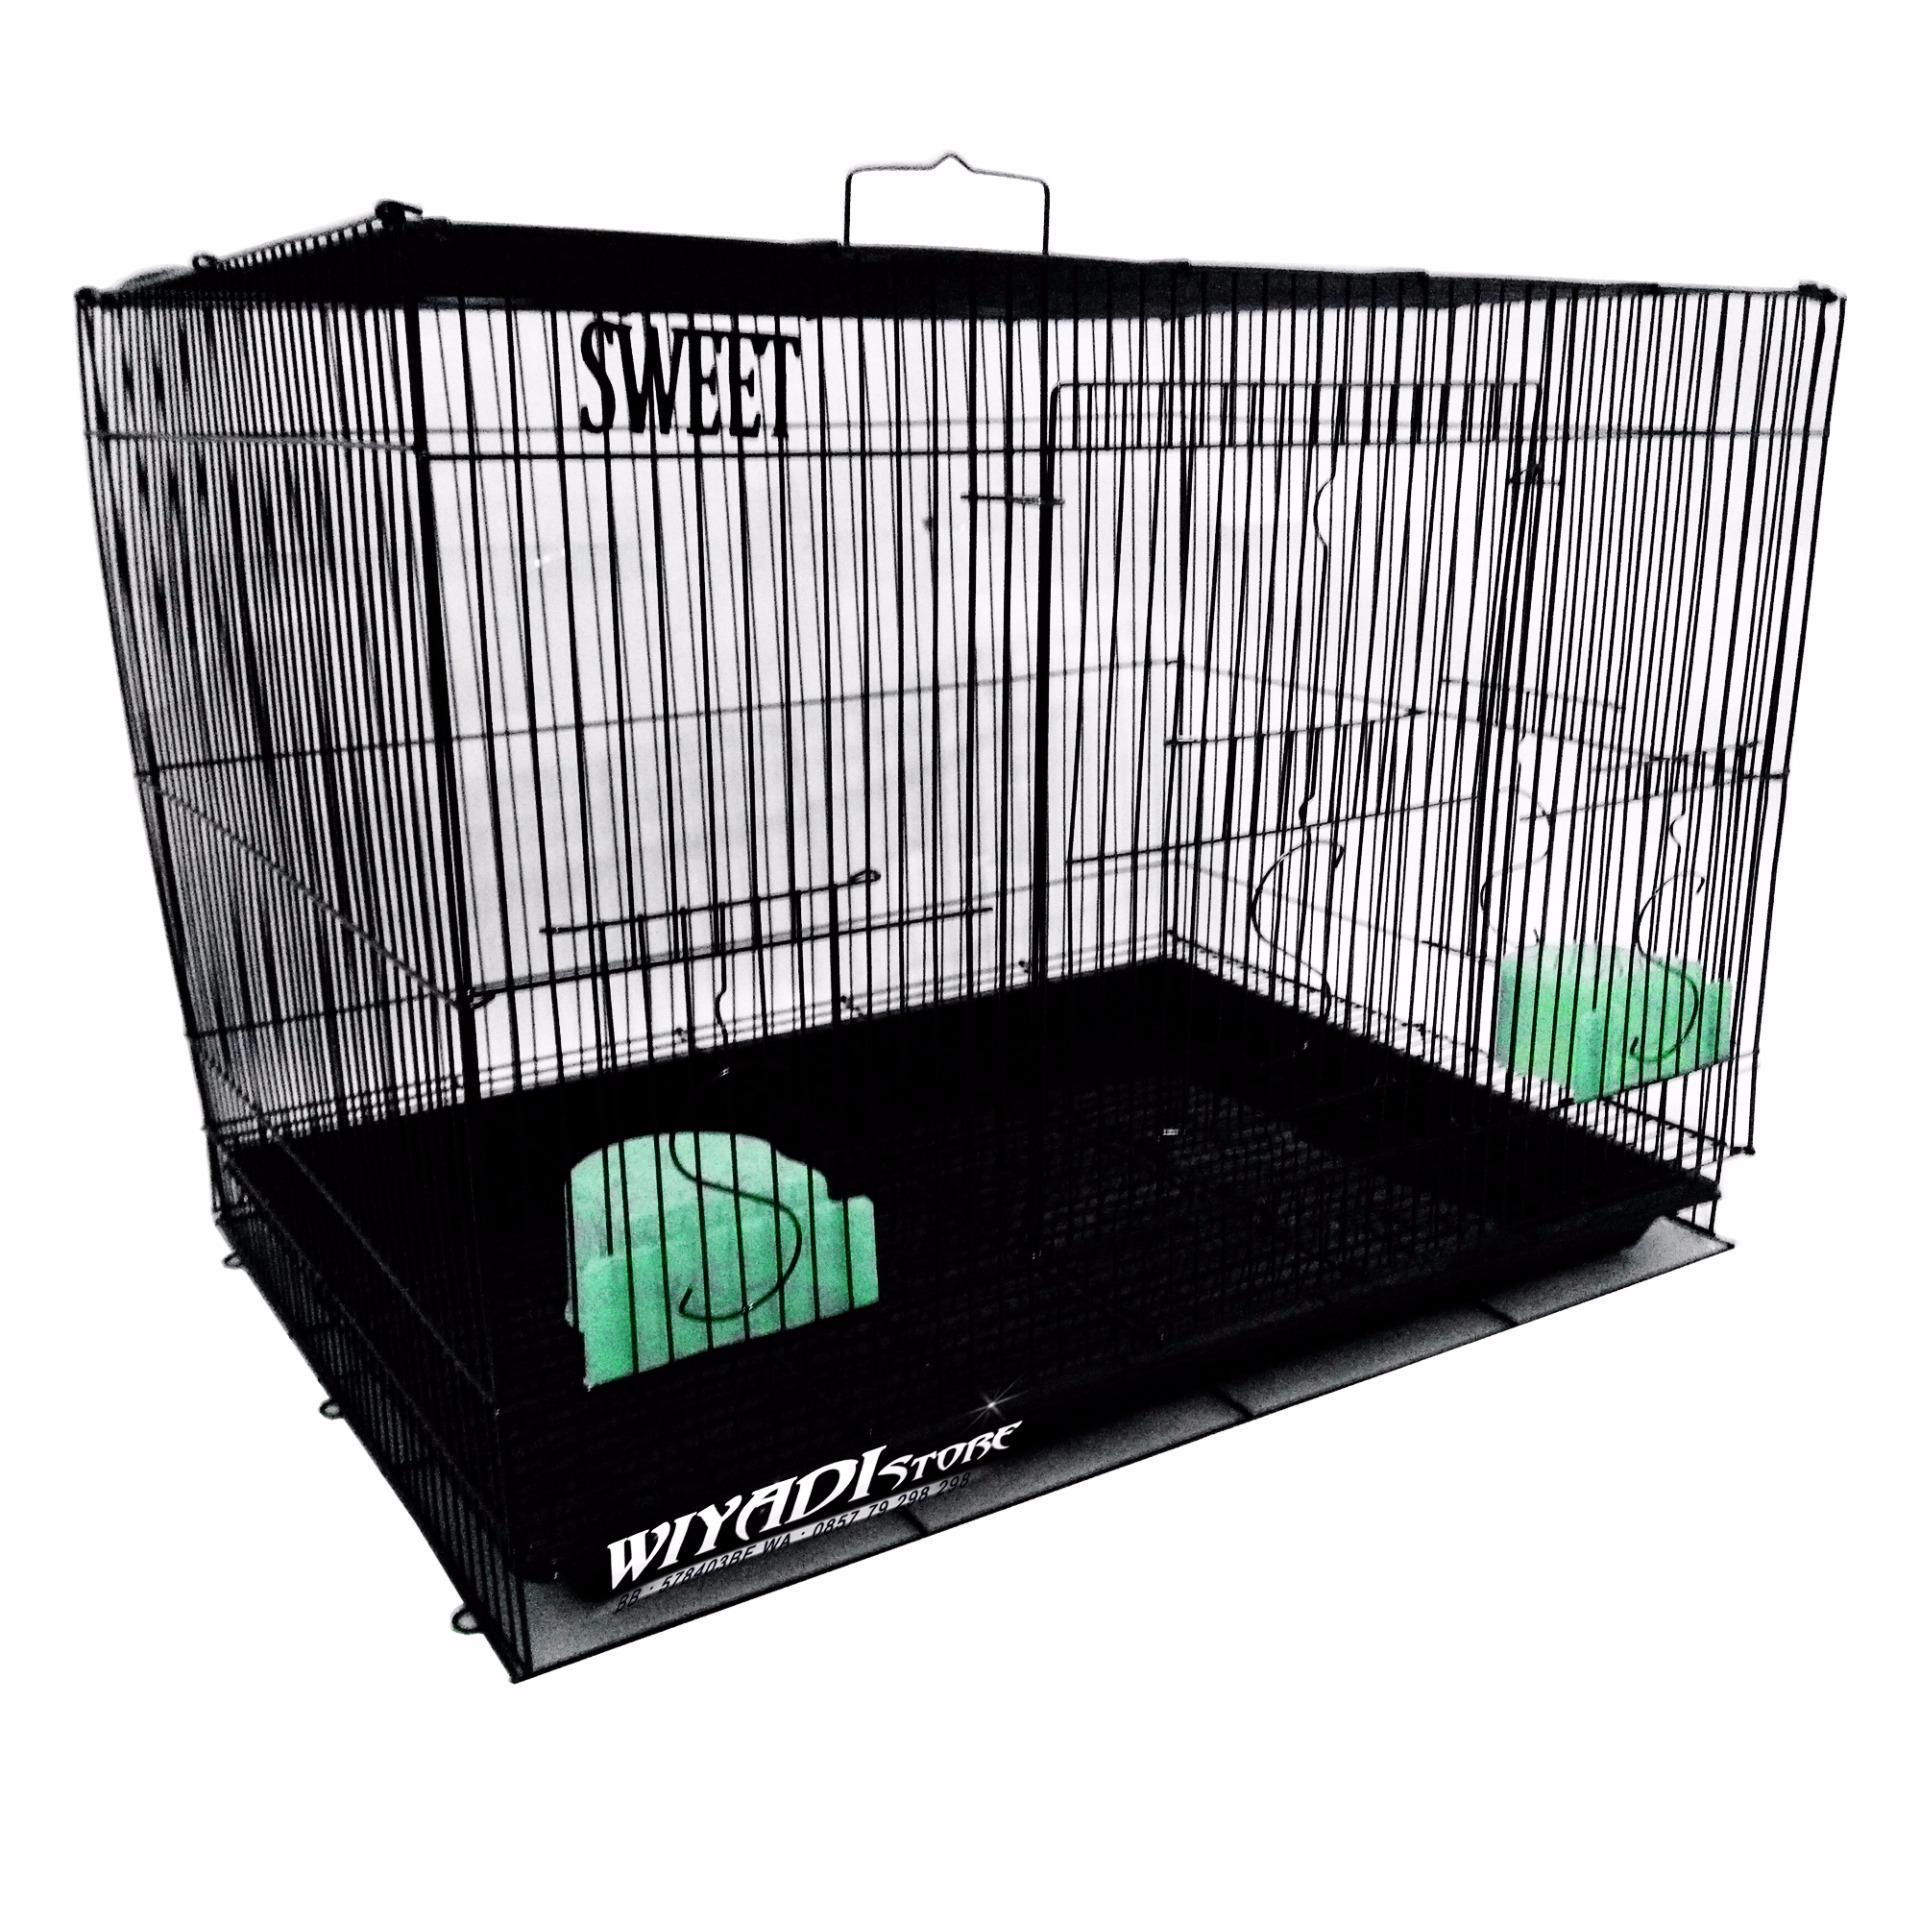 Cuci Gudang Wiyadistore K12 Kandang Kucing Besi Lipat Besar 60P Black